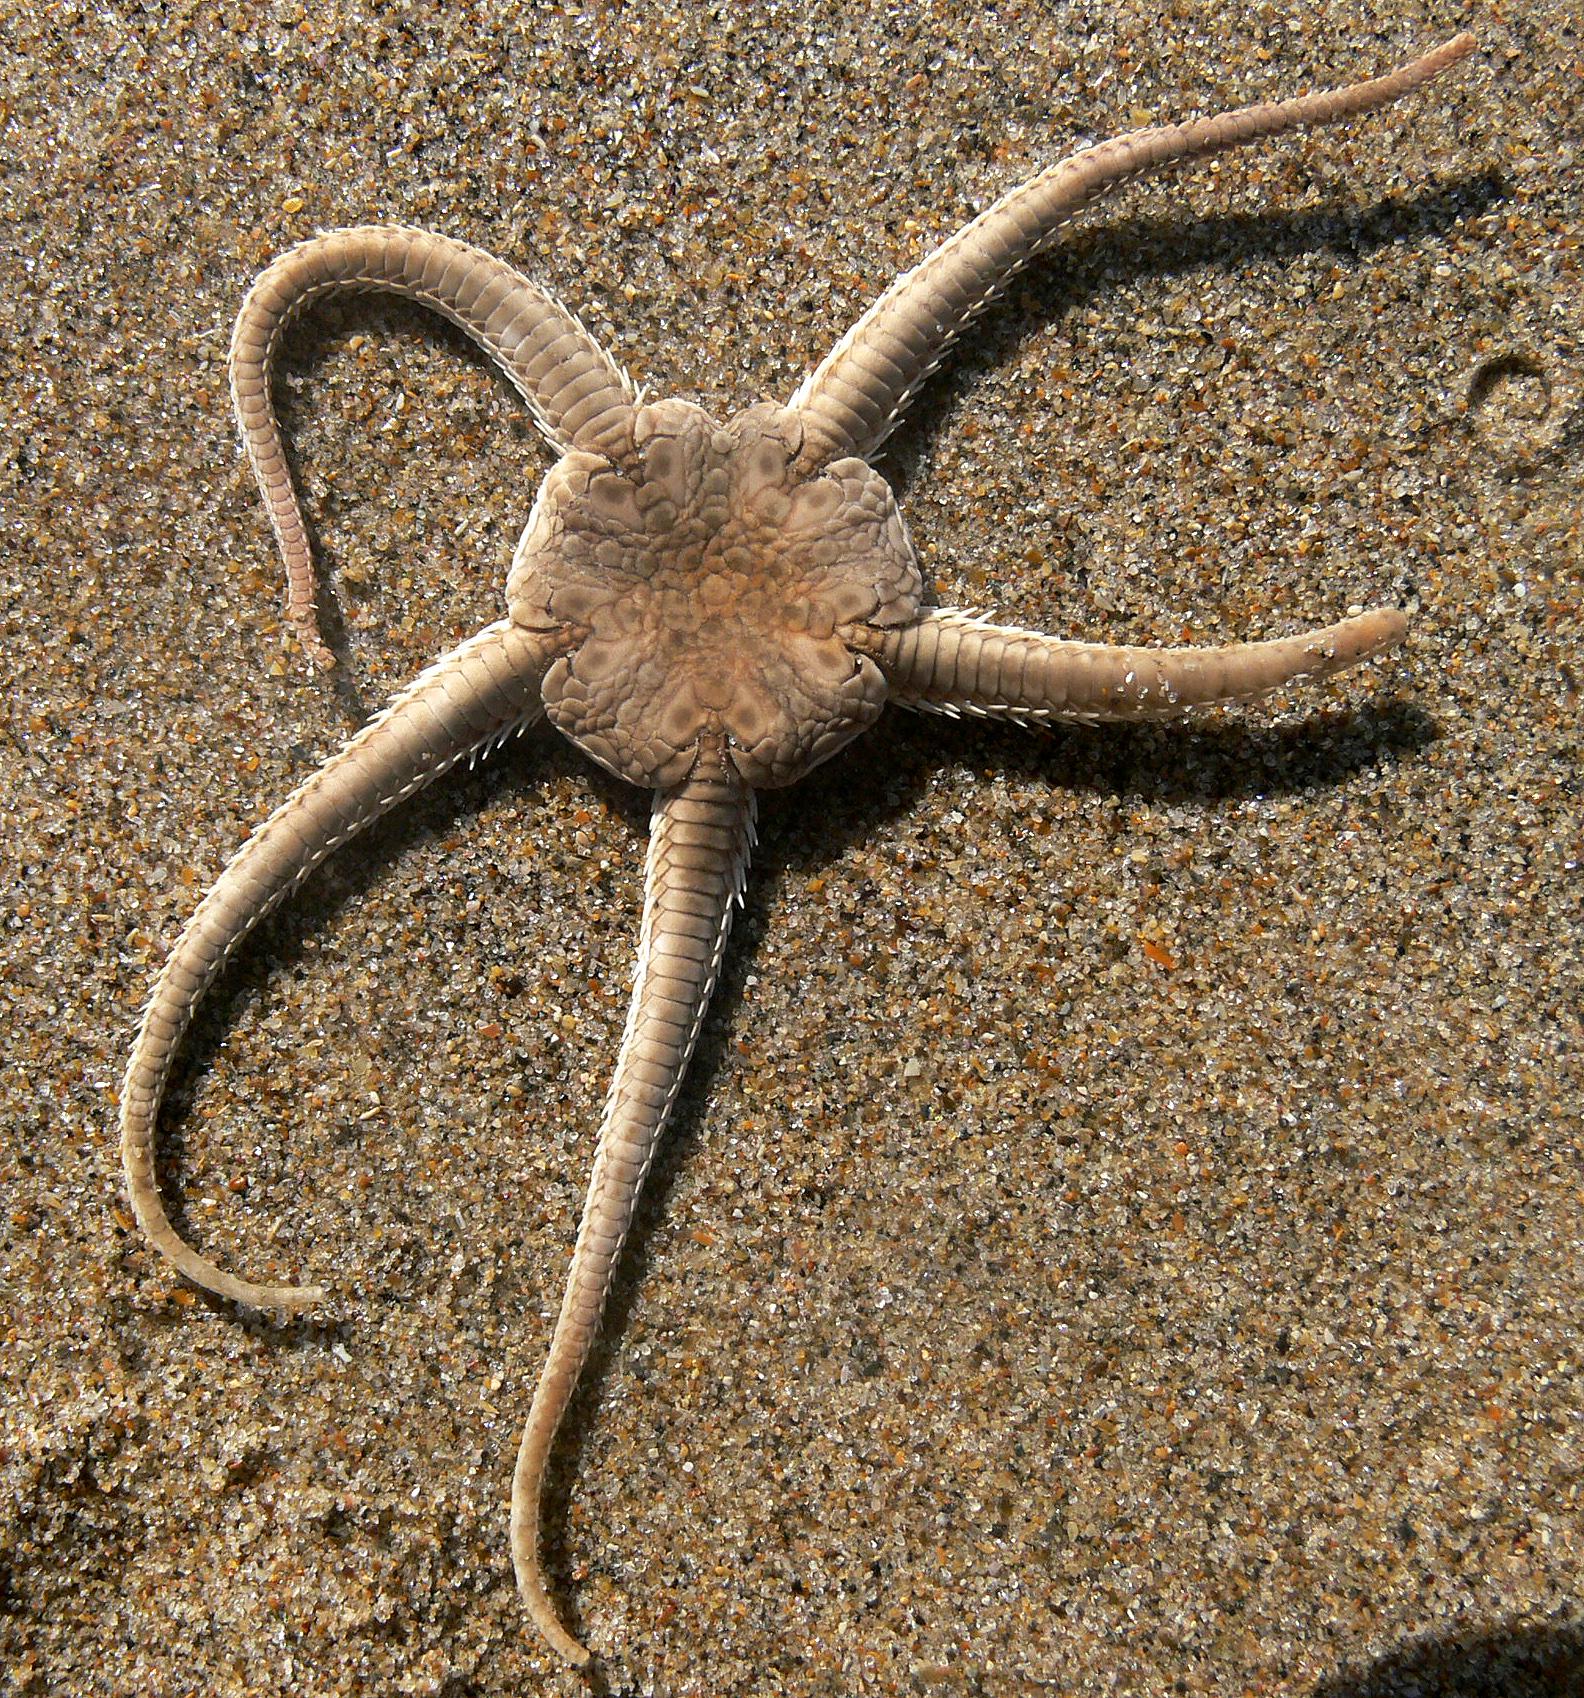 Brittle star - Wikipedia